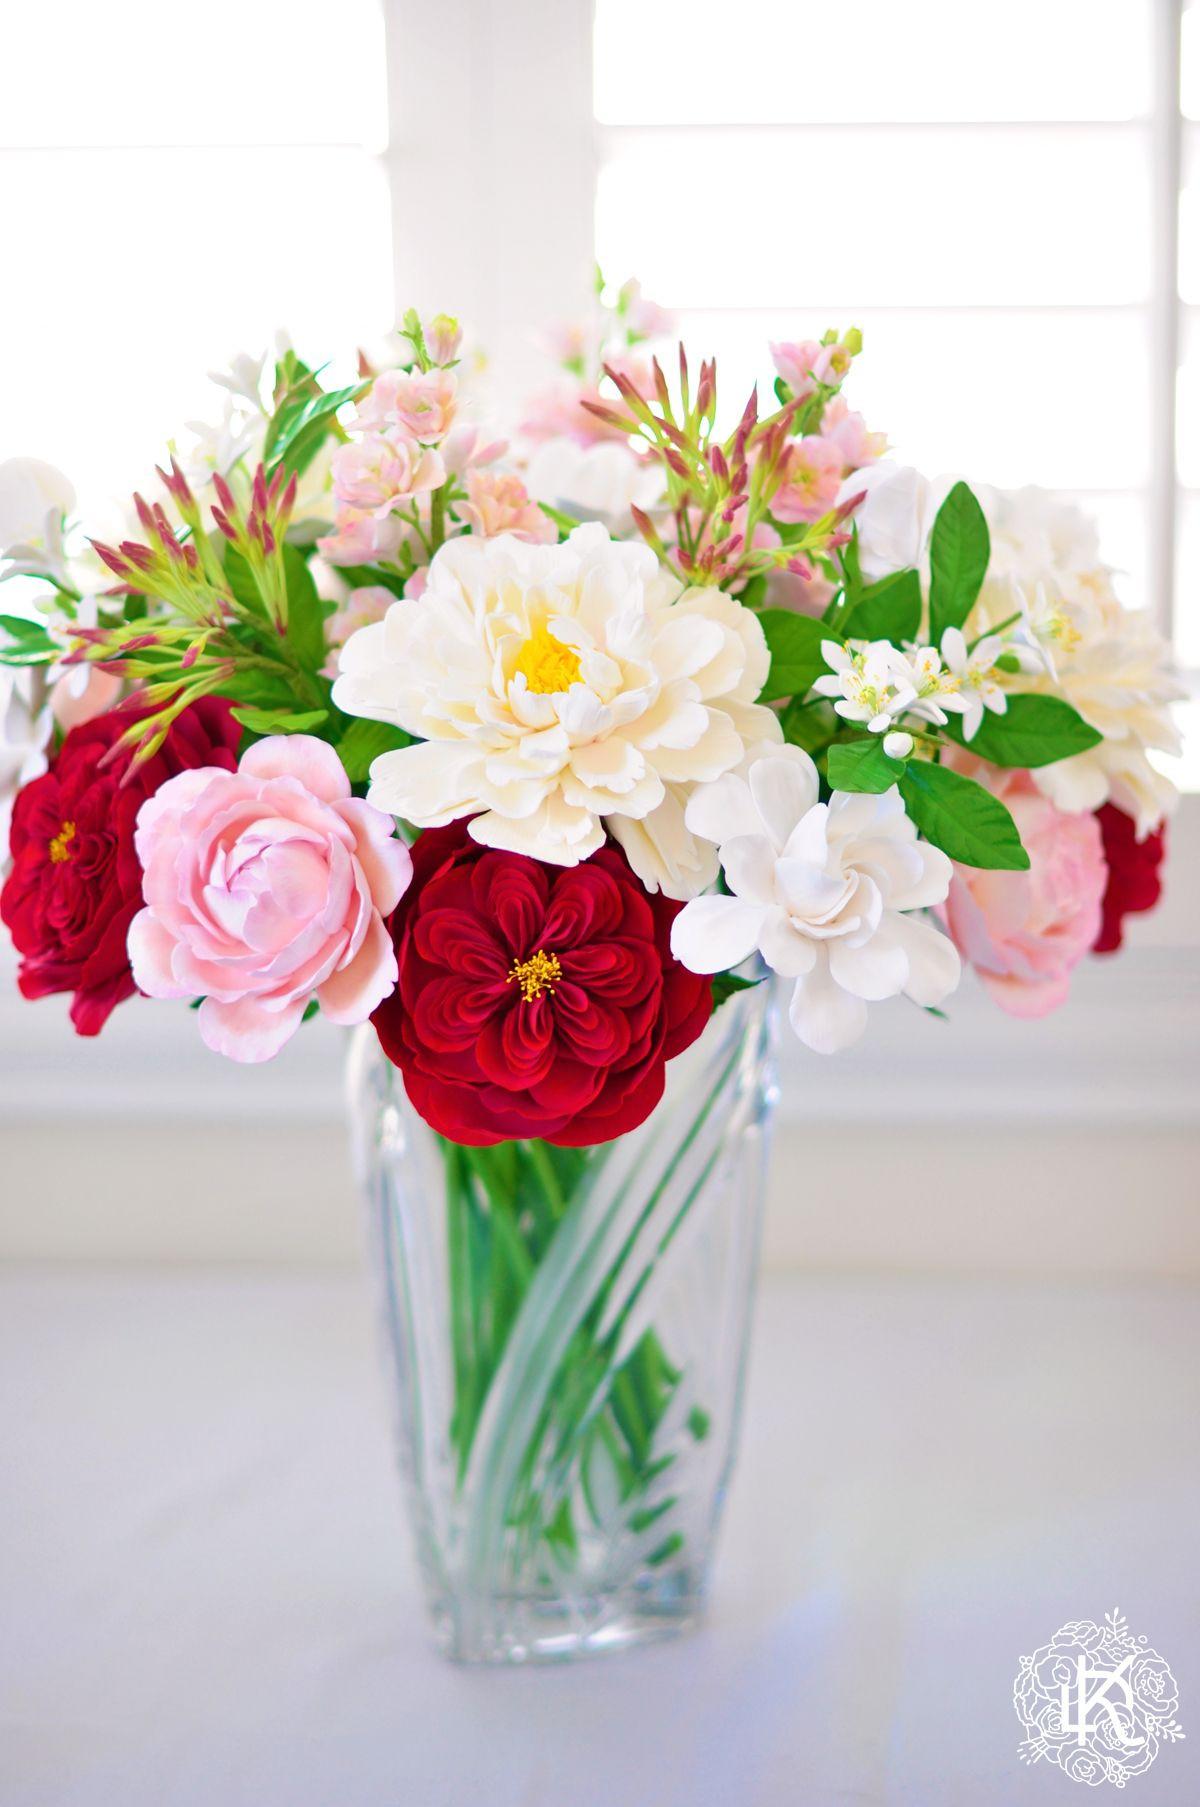 Round Vase Flower Arrangements Of 28 Tall Trumpet Vases the Weekly World with Regard to orange Flower Arrangements Tall Vases Flowers Healthy